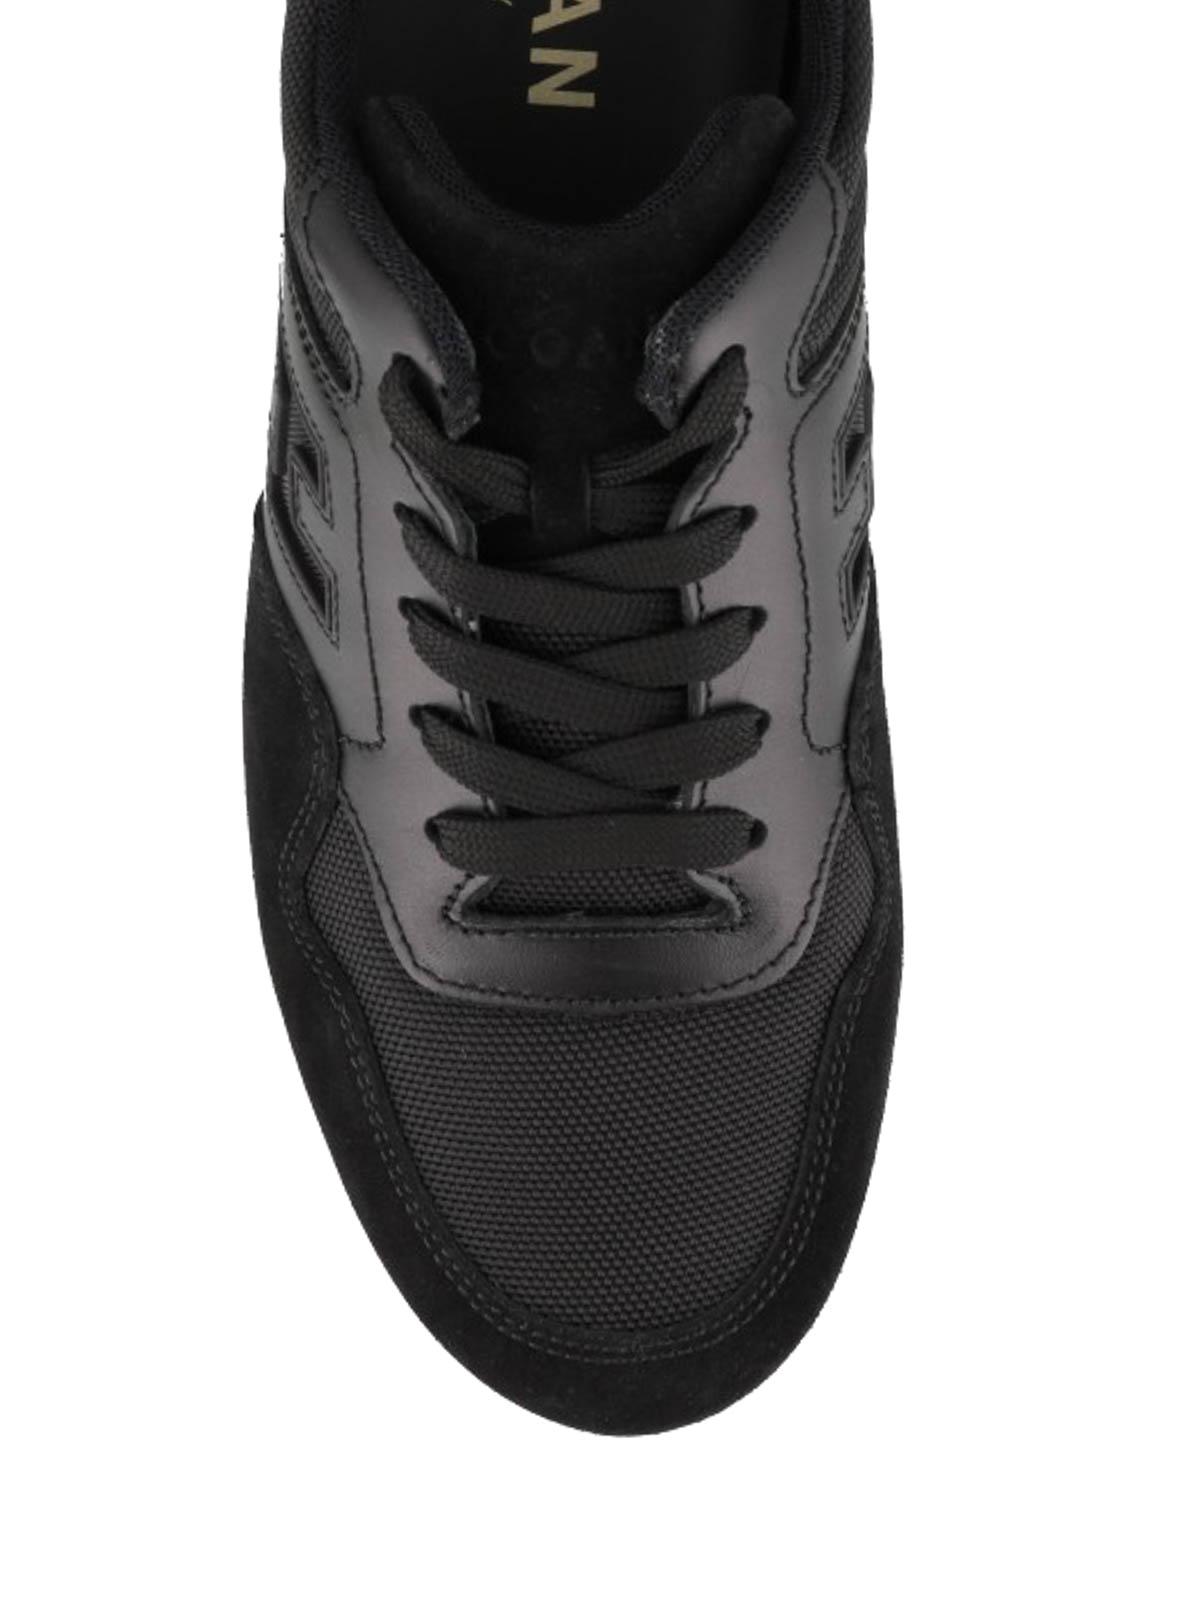 Trainers Hogan - Olympia X - H205 black sneakers - HXM2050X602JMIB999